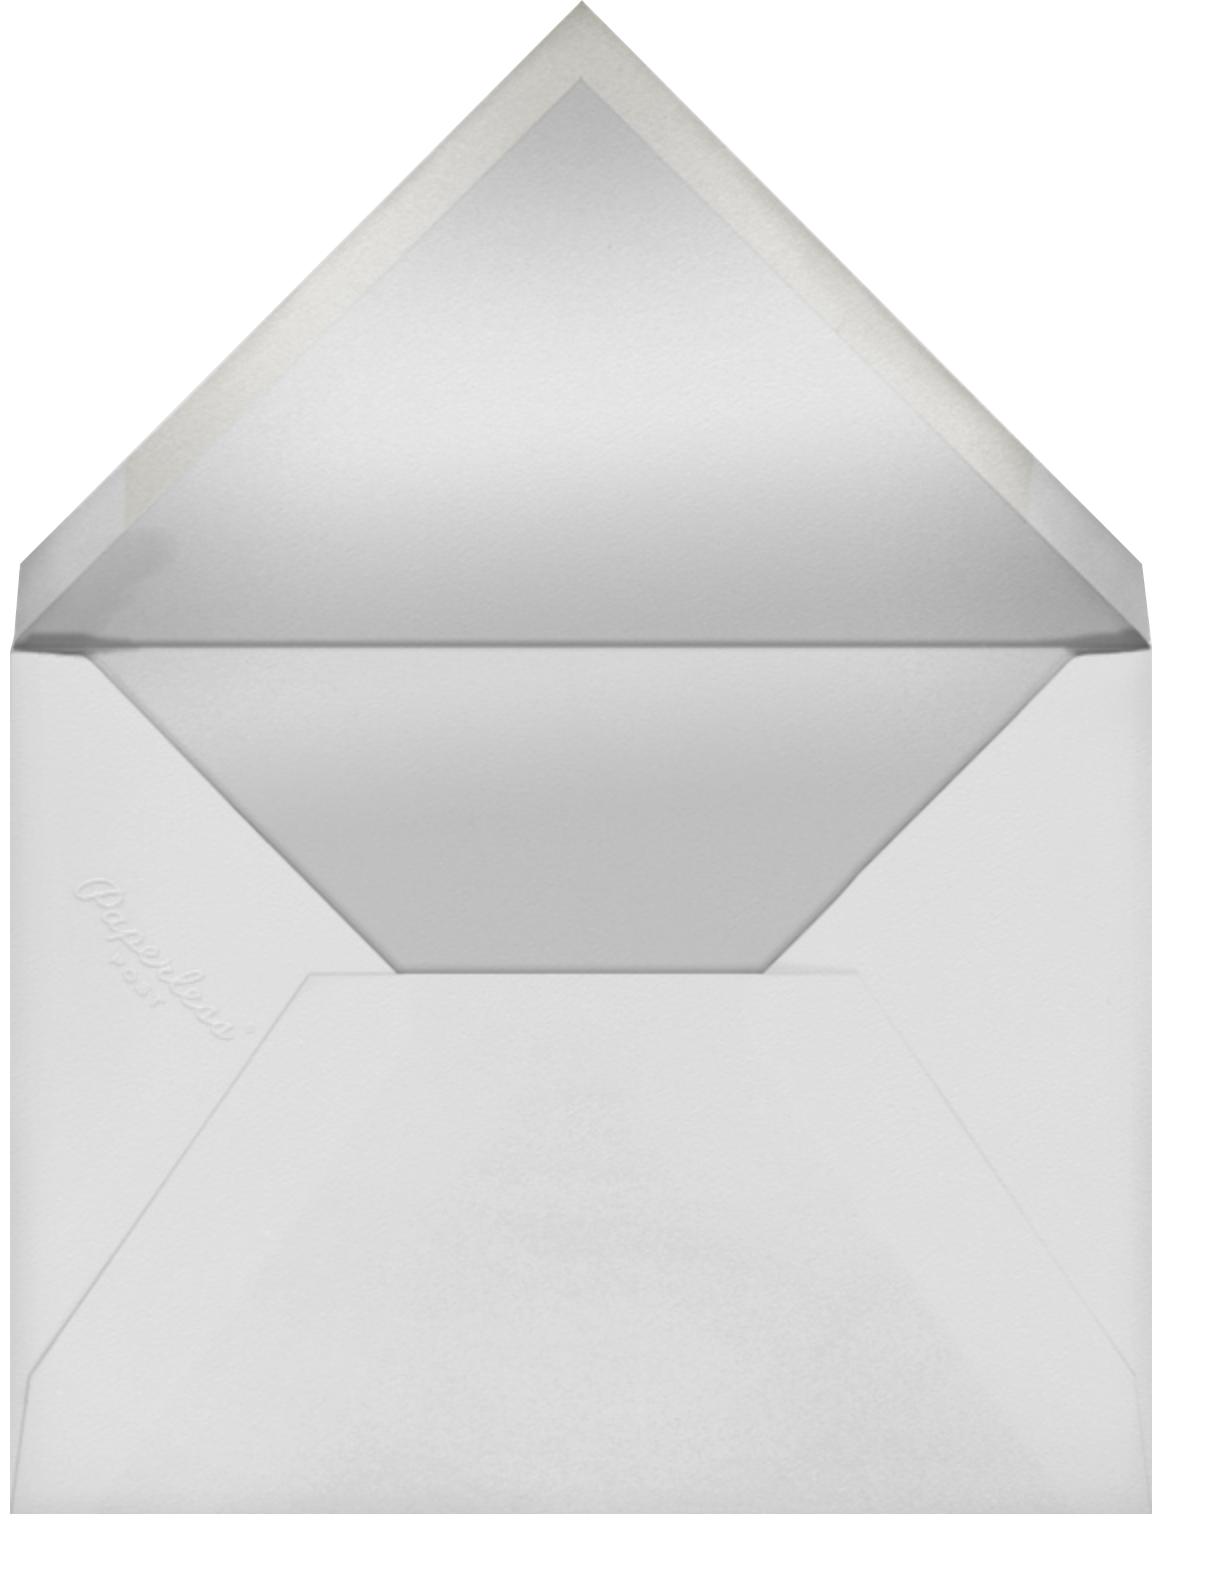 Nissuin (Menu) - Millet - Paperless Post - Menus - envelope back